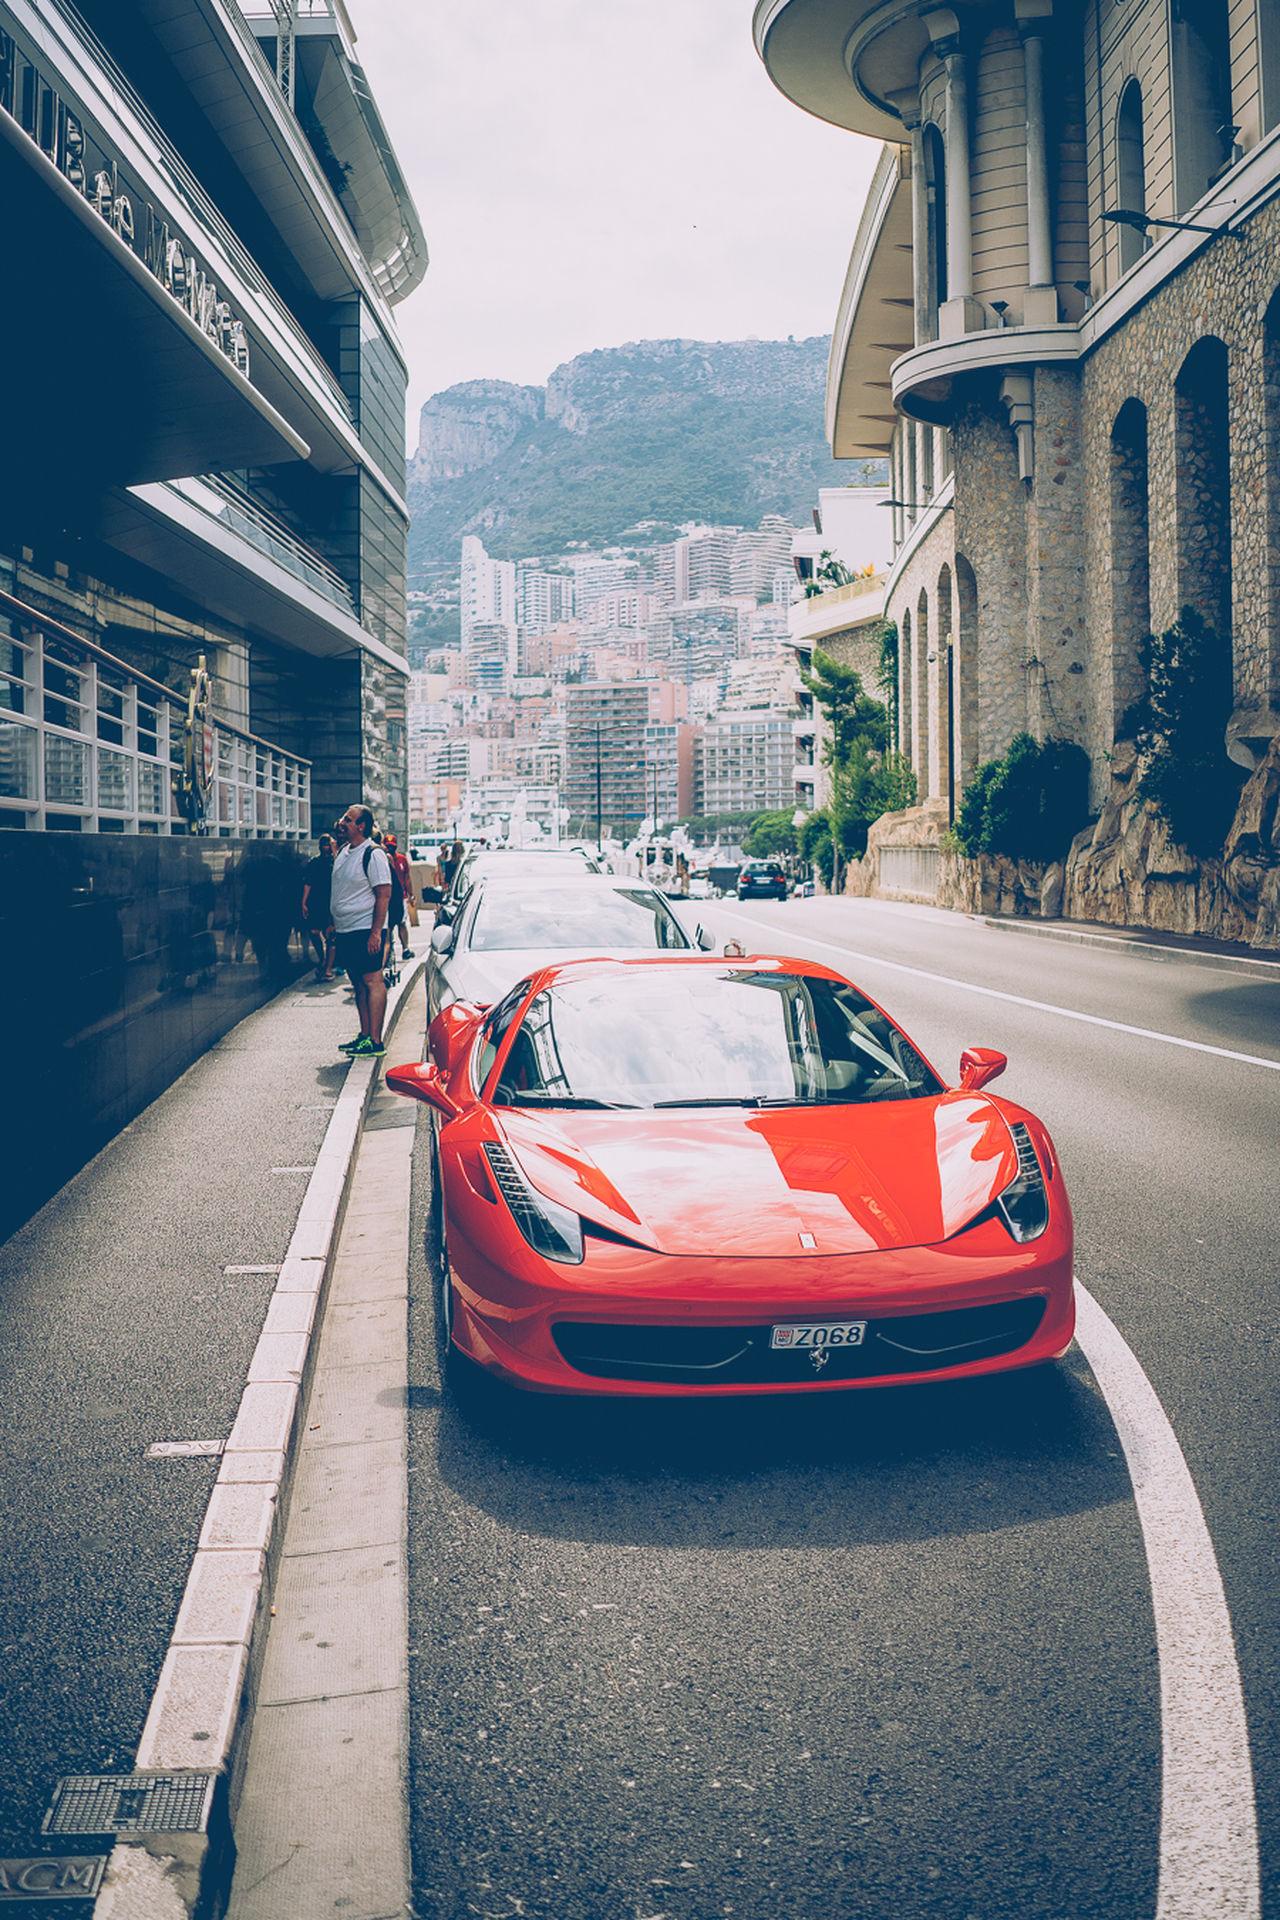 Beautiful stock photos of monaco, car, city, city life, architecture